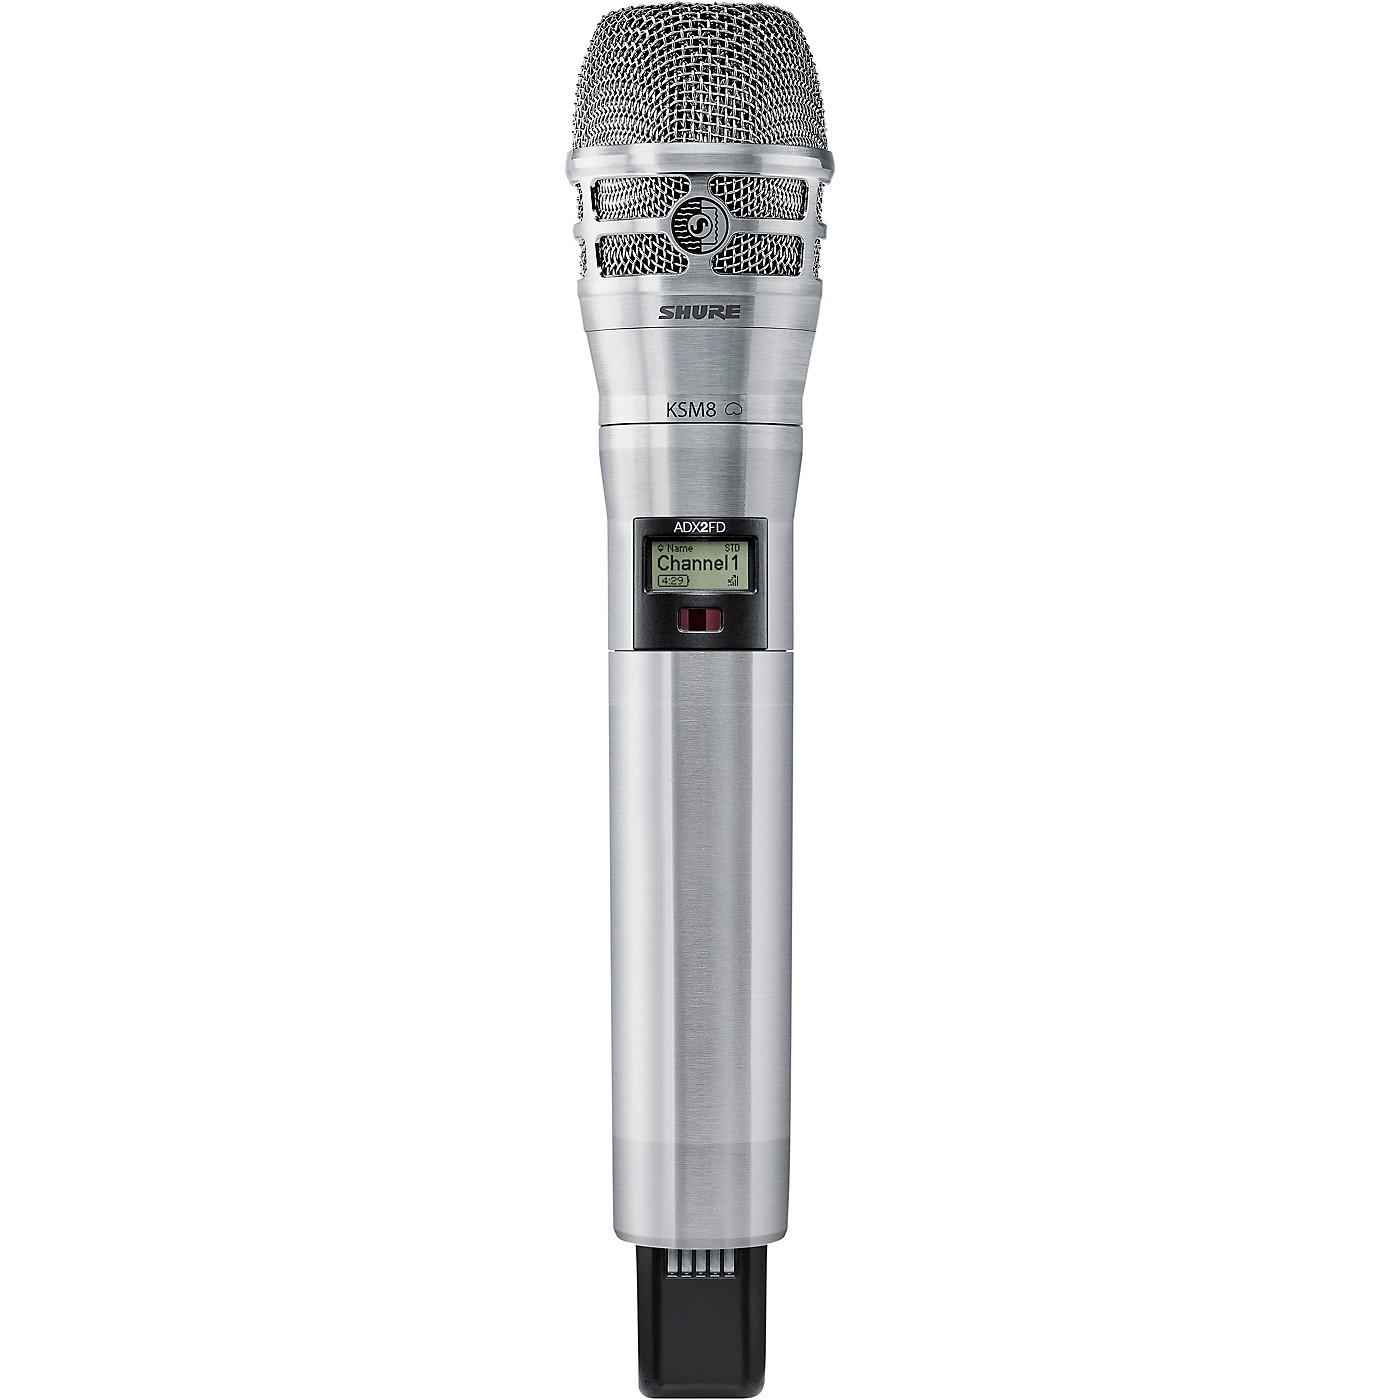 Shure Axient Digital ADX2FD/K8N Wireless Handheld Microphone Transmitter With KSM8 Capsule in Nickel thumbnail